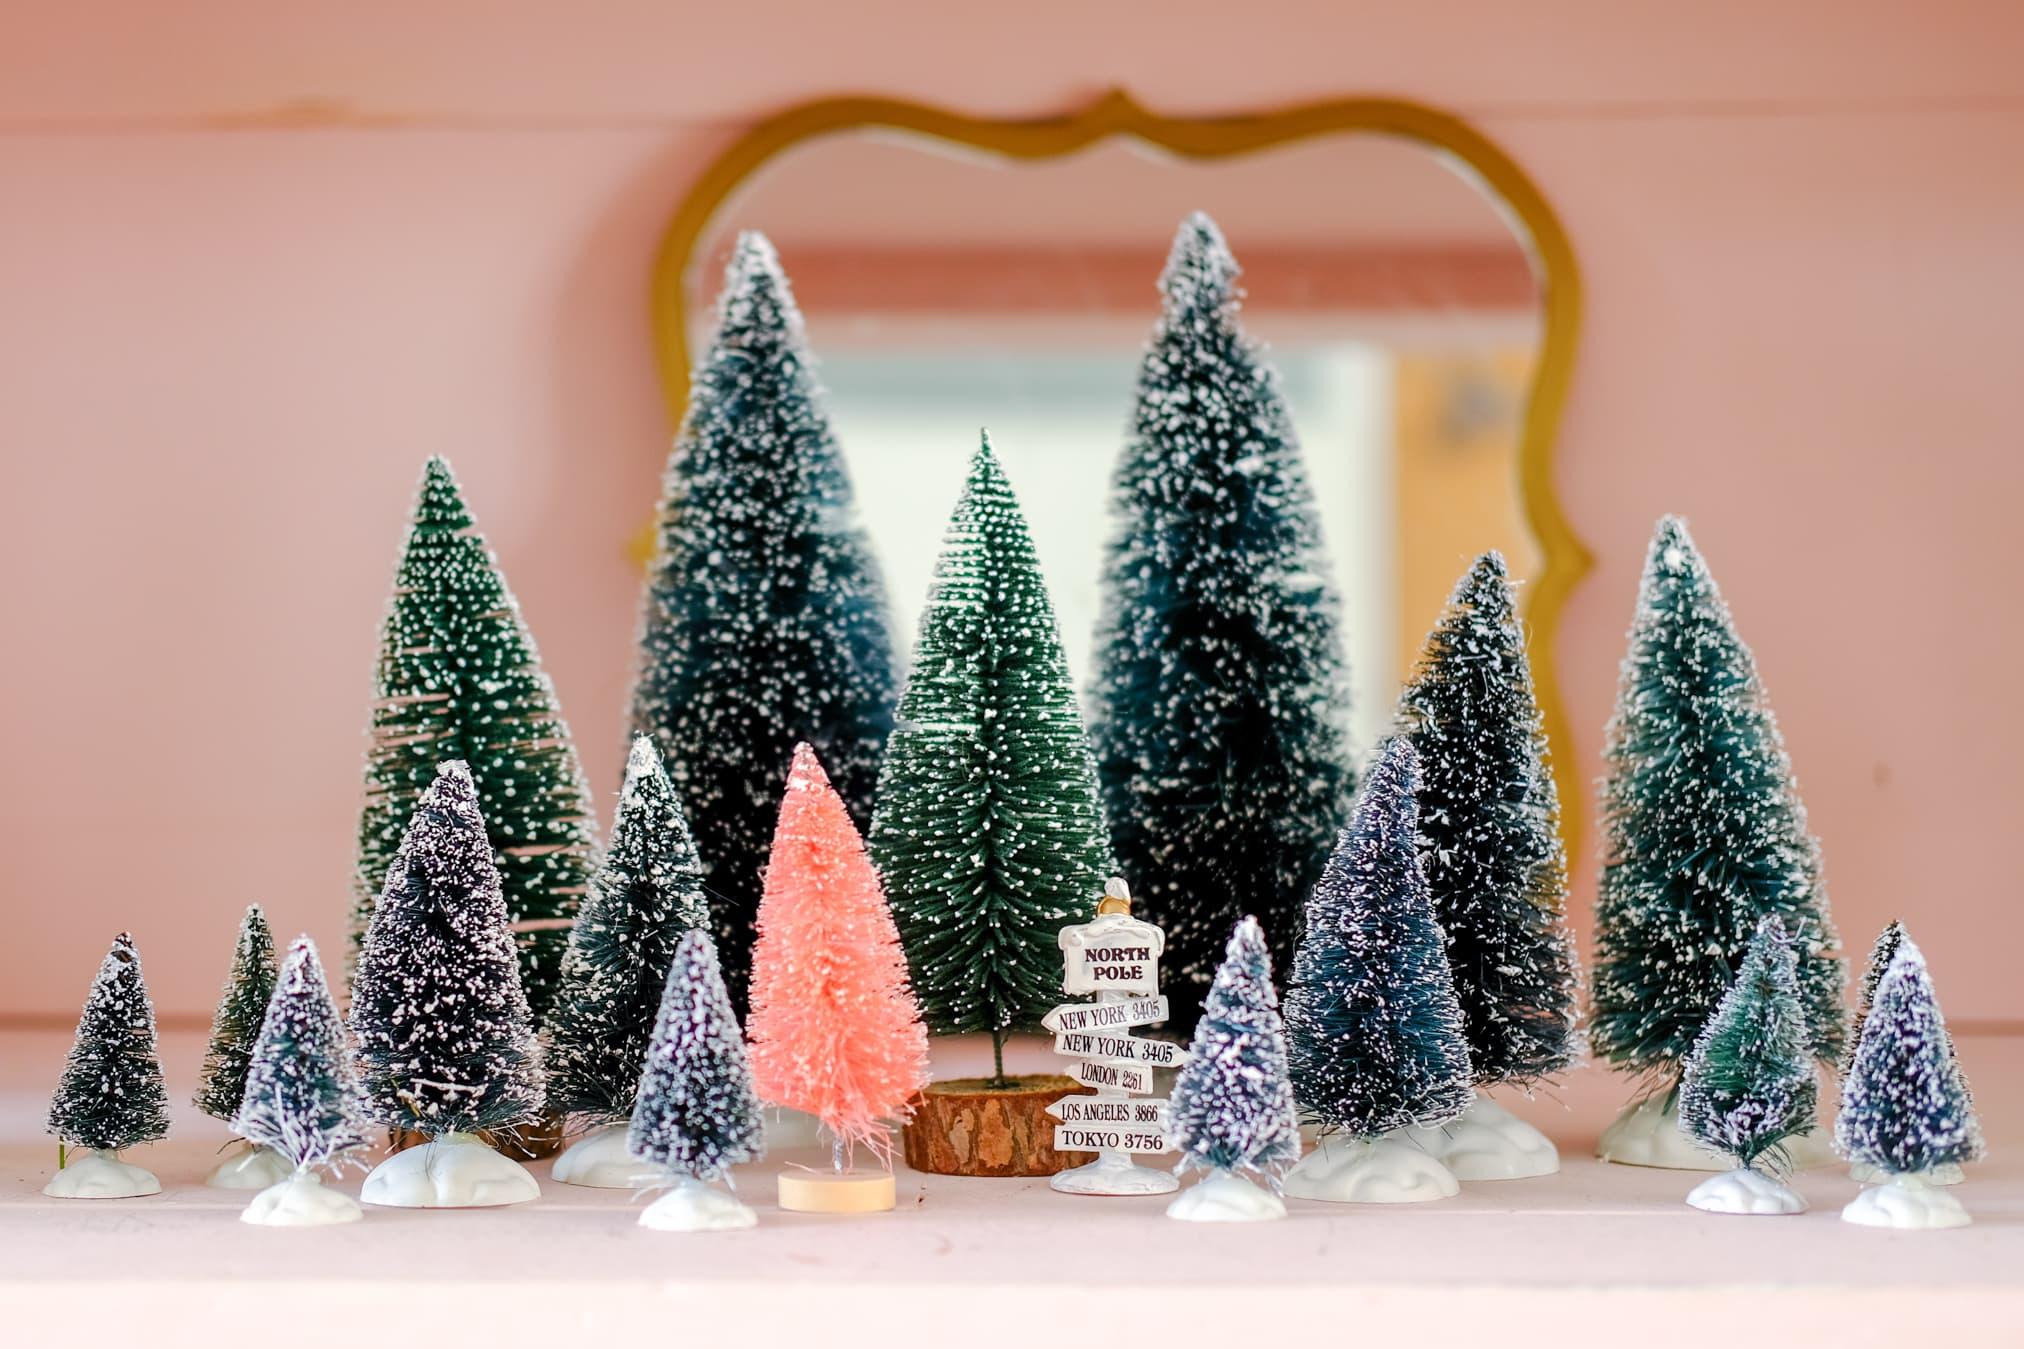 kerstbomen verzameling